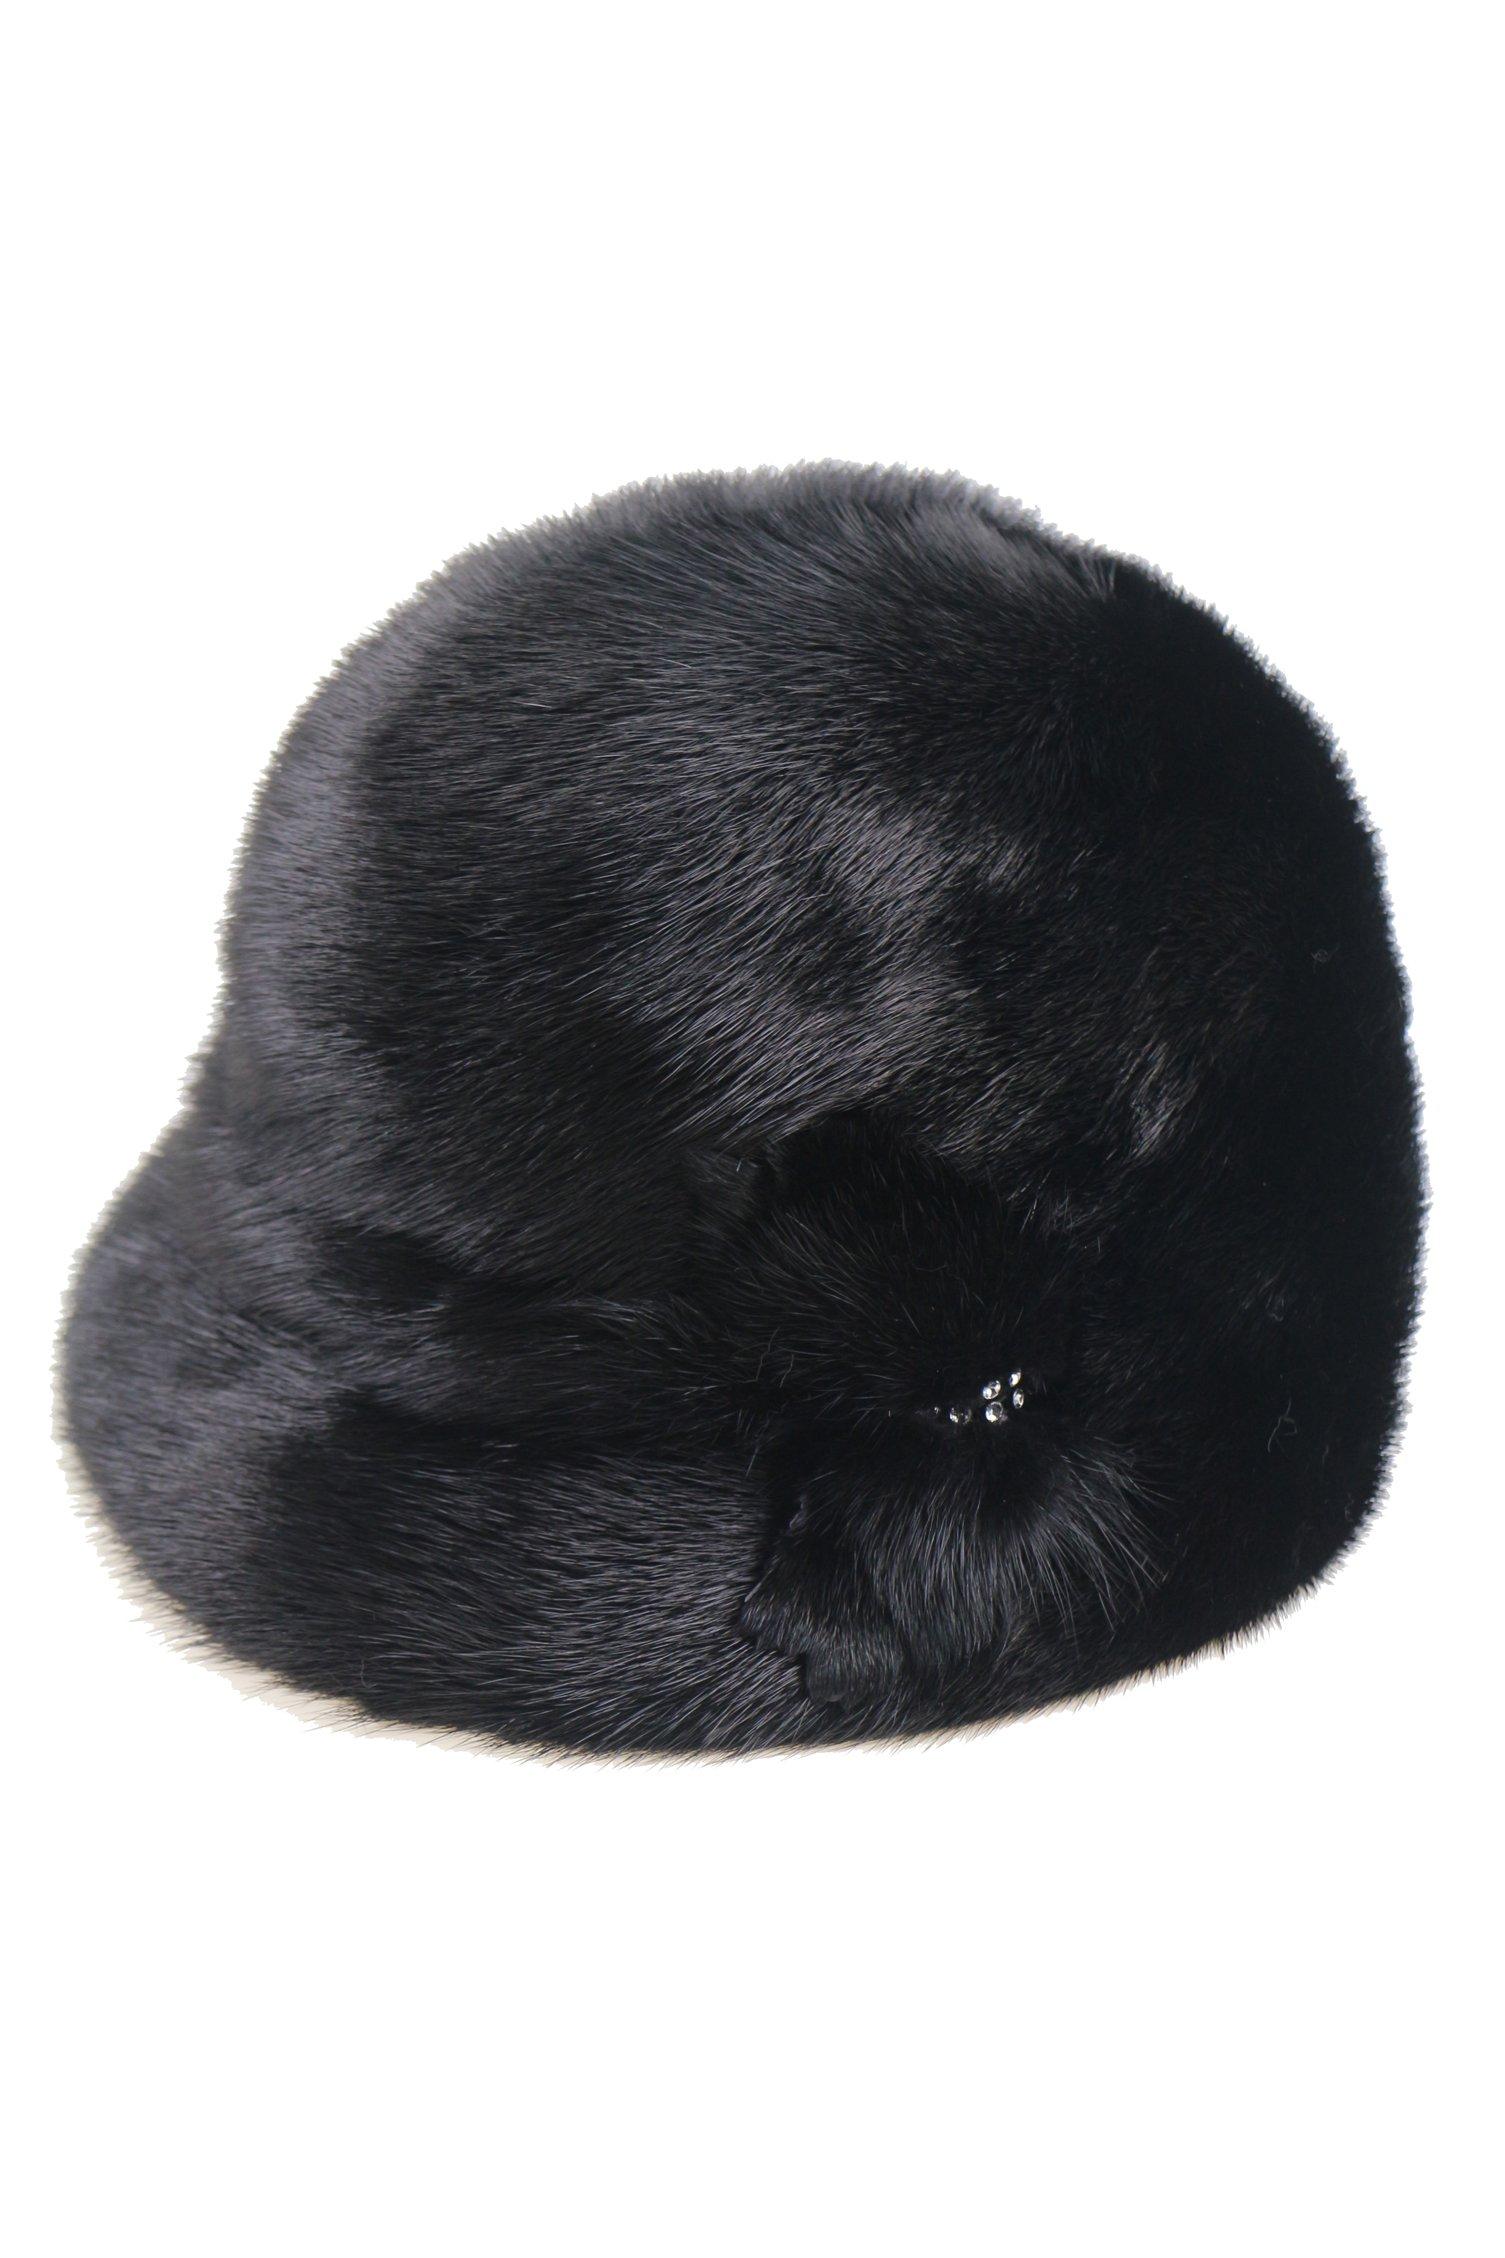 Ysting Real Genuine Mink Fur Women's Beanies Hat Slouchy Hat